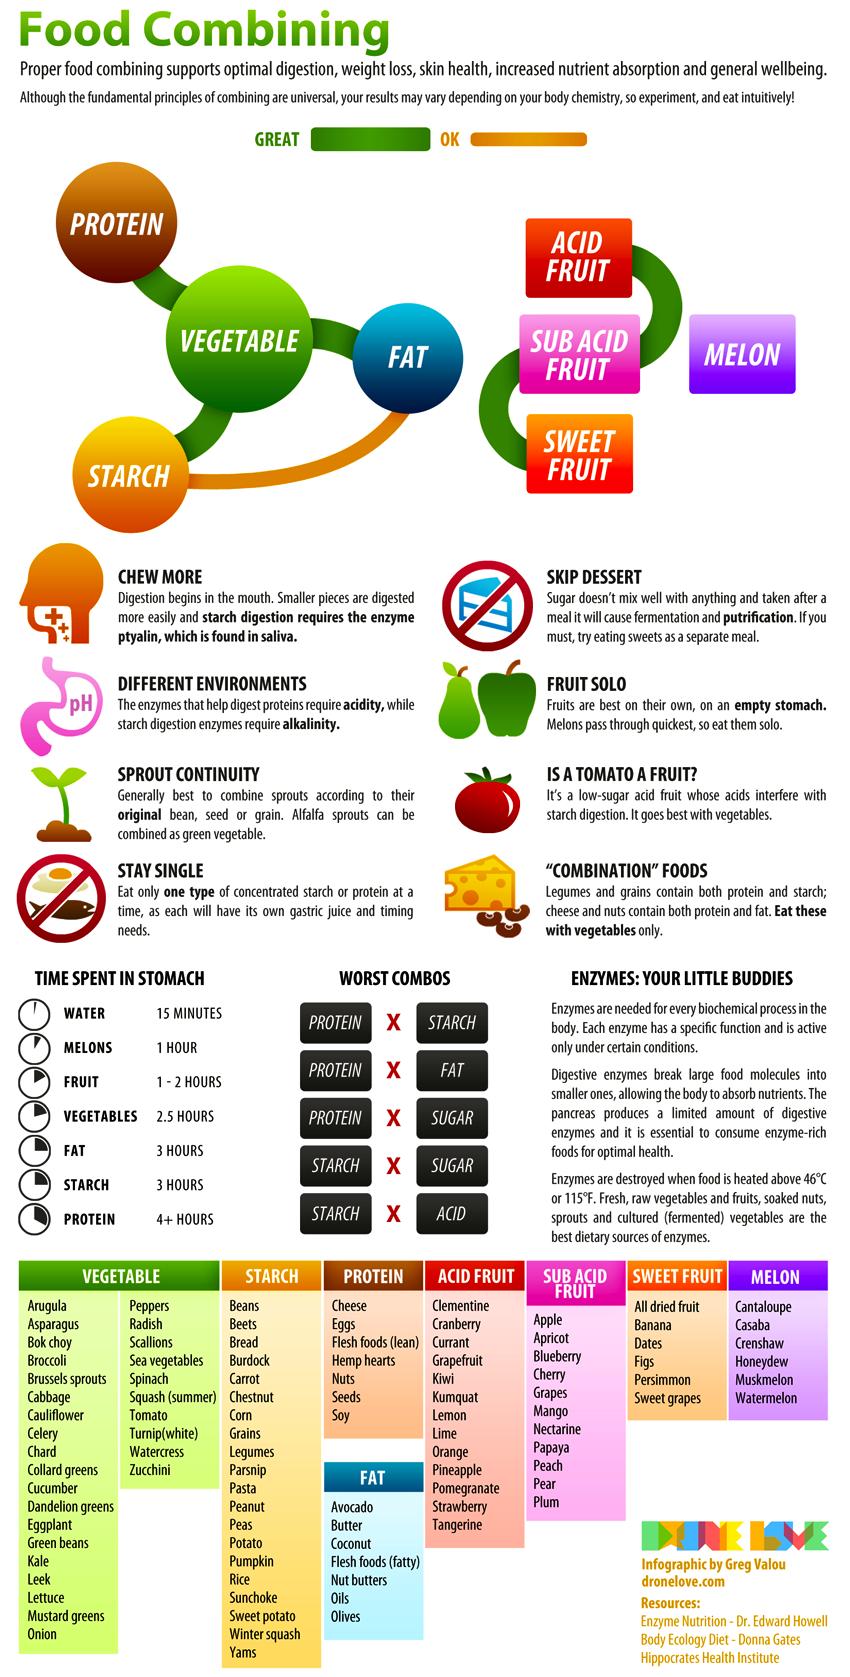 Food combining chart arbonne cleanse pinterest food combining food combining chart forumfinder Gallery